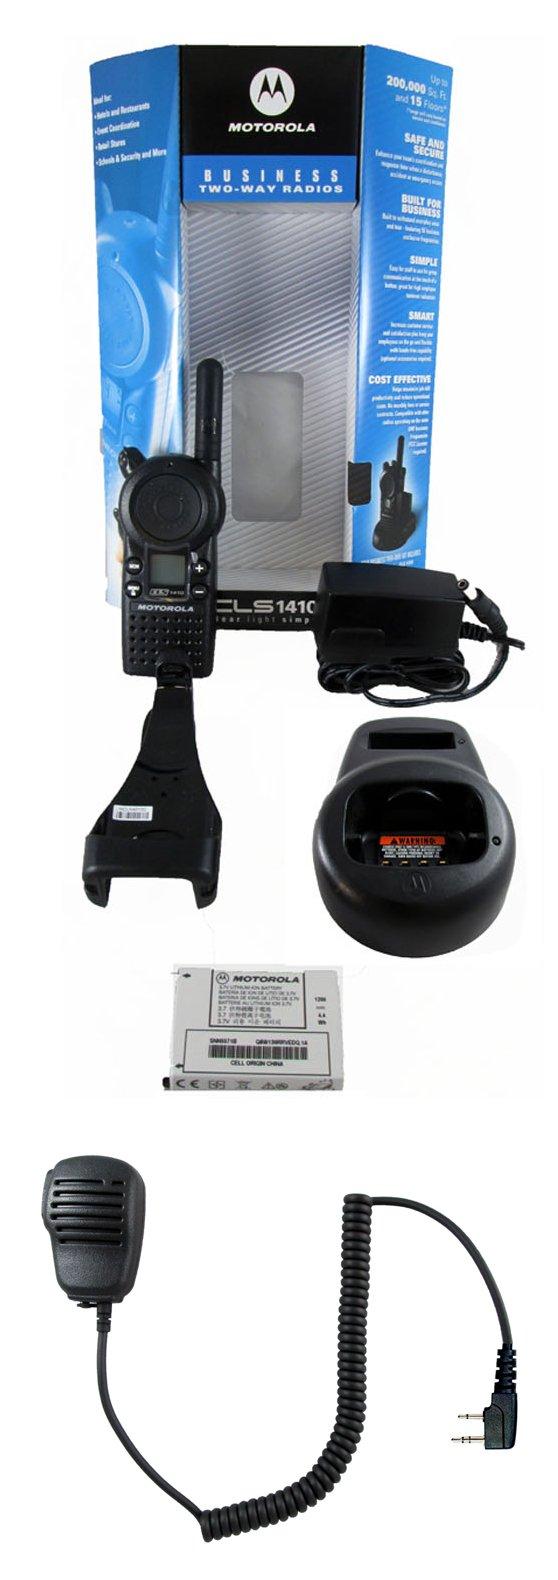 Motorola CLS1410 1 watt 4 channel business radio and Speaker Microphone